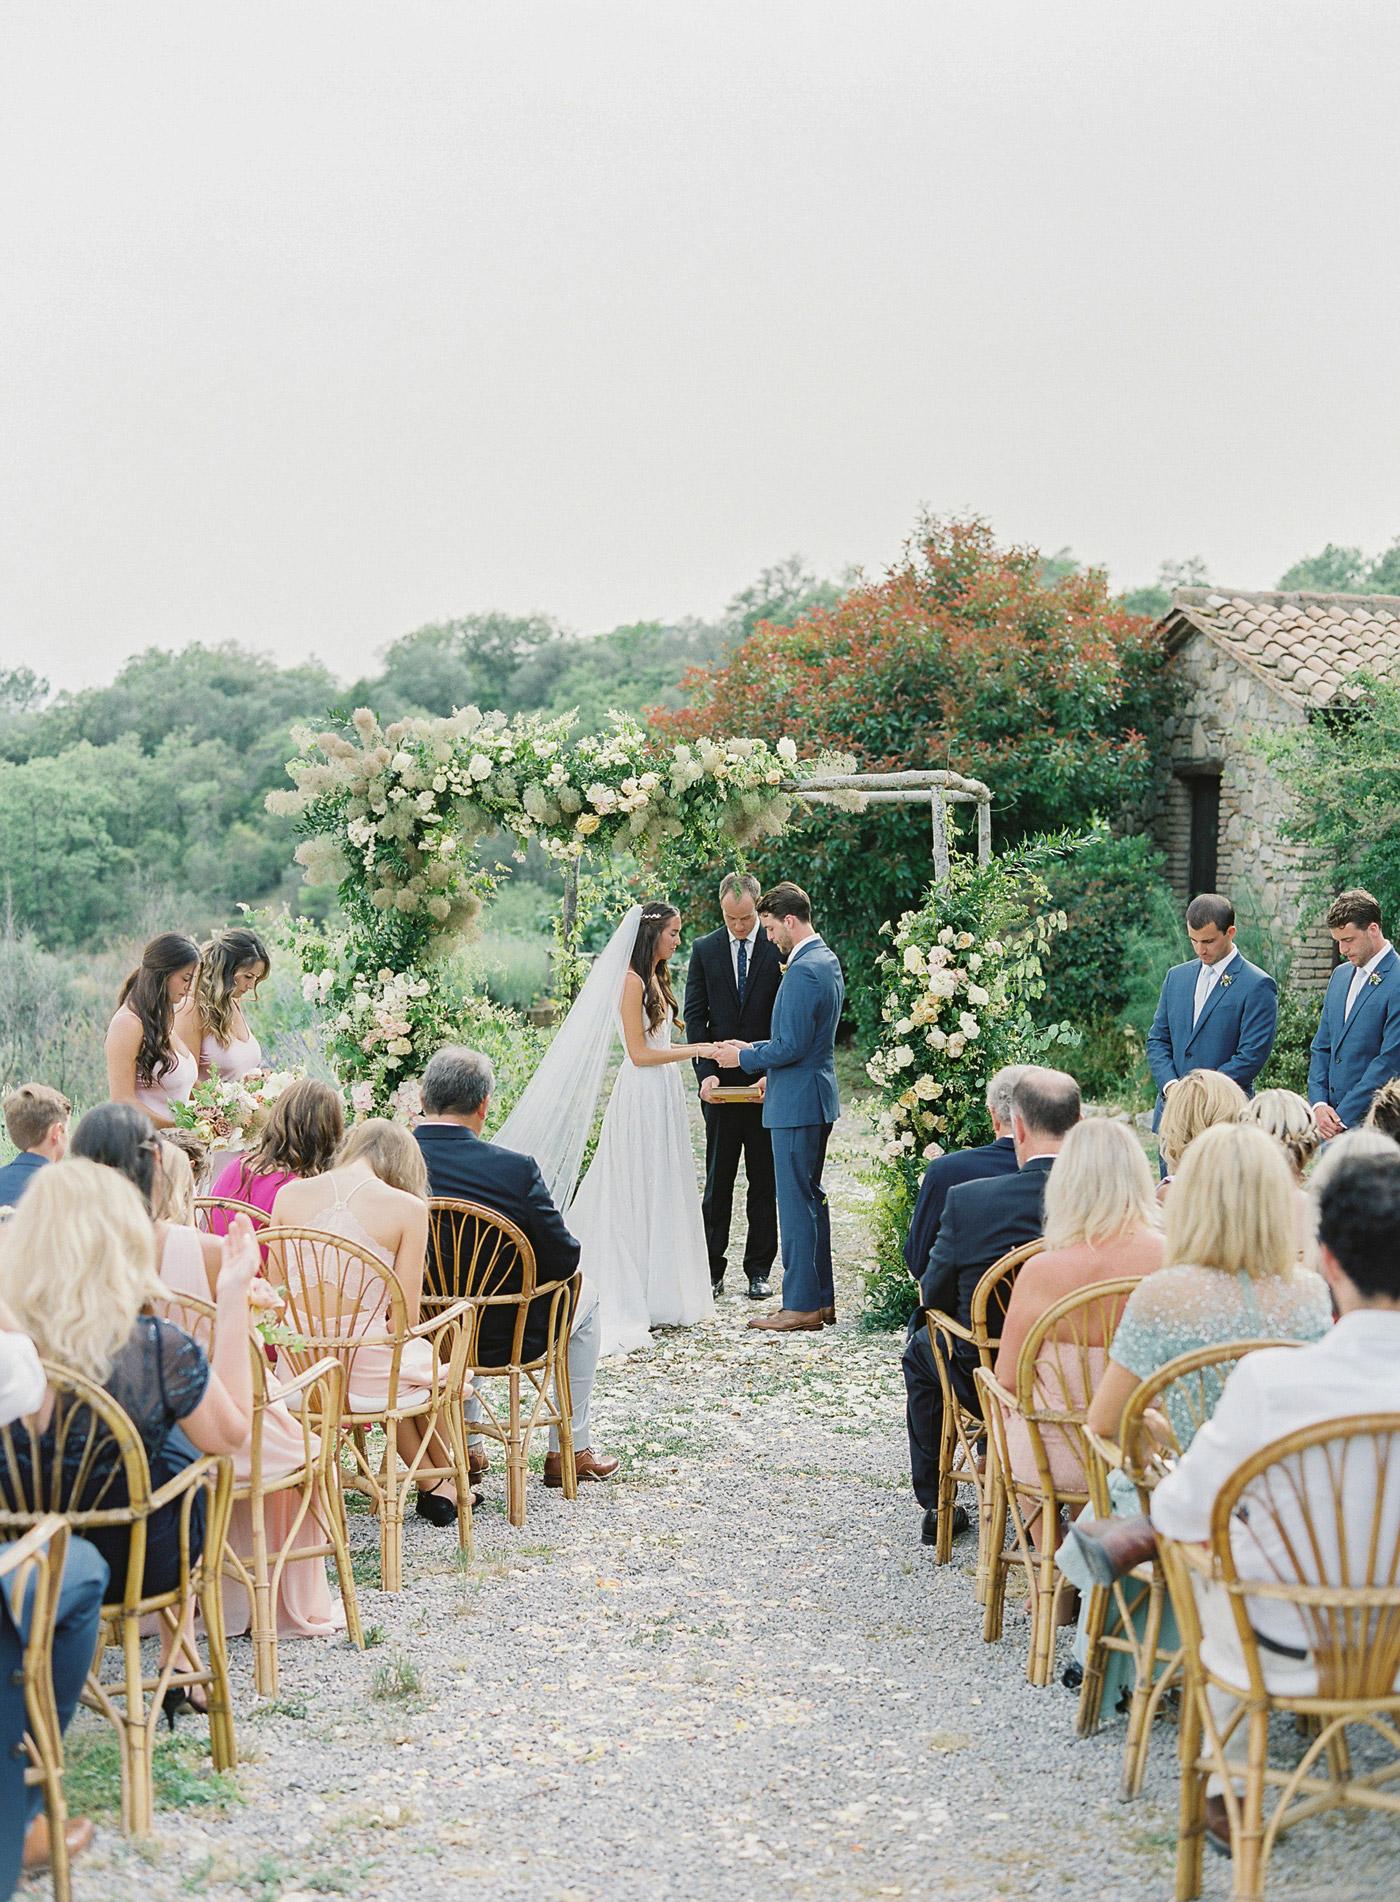 Madison and James wedding ceremony